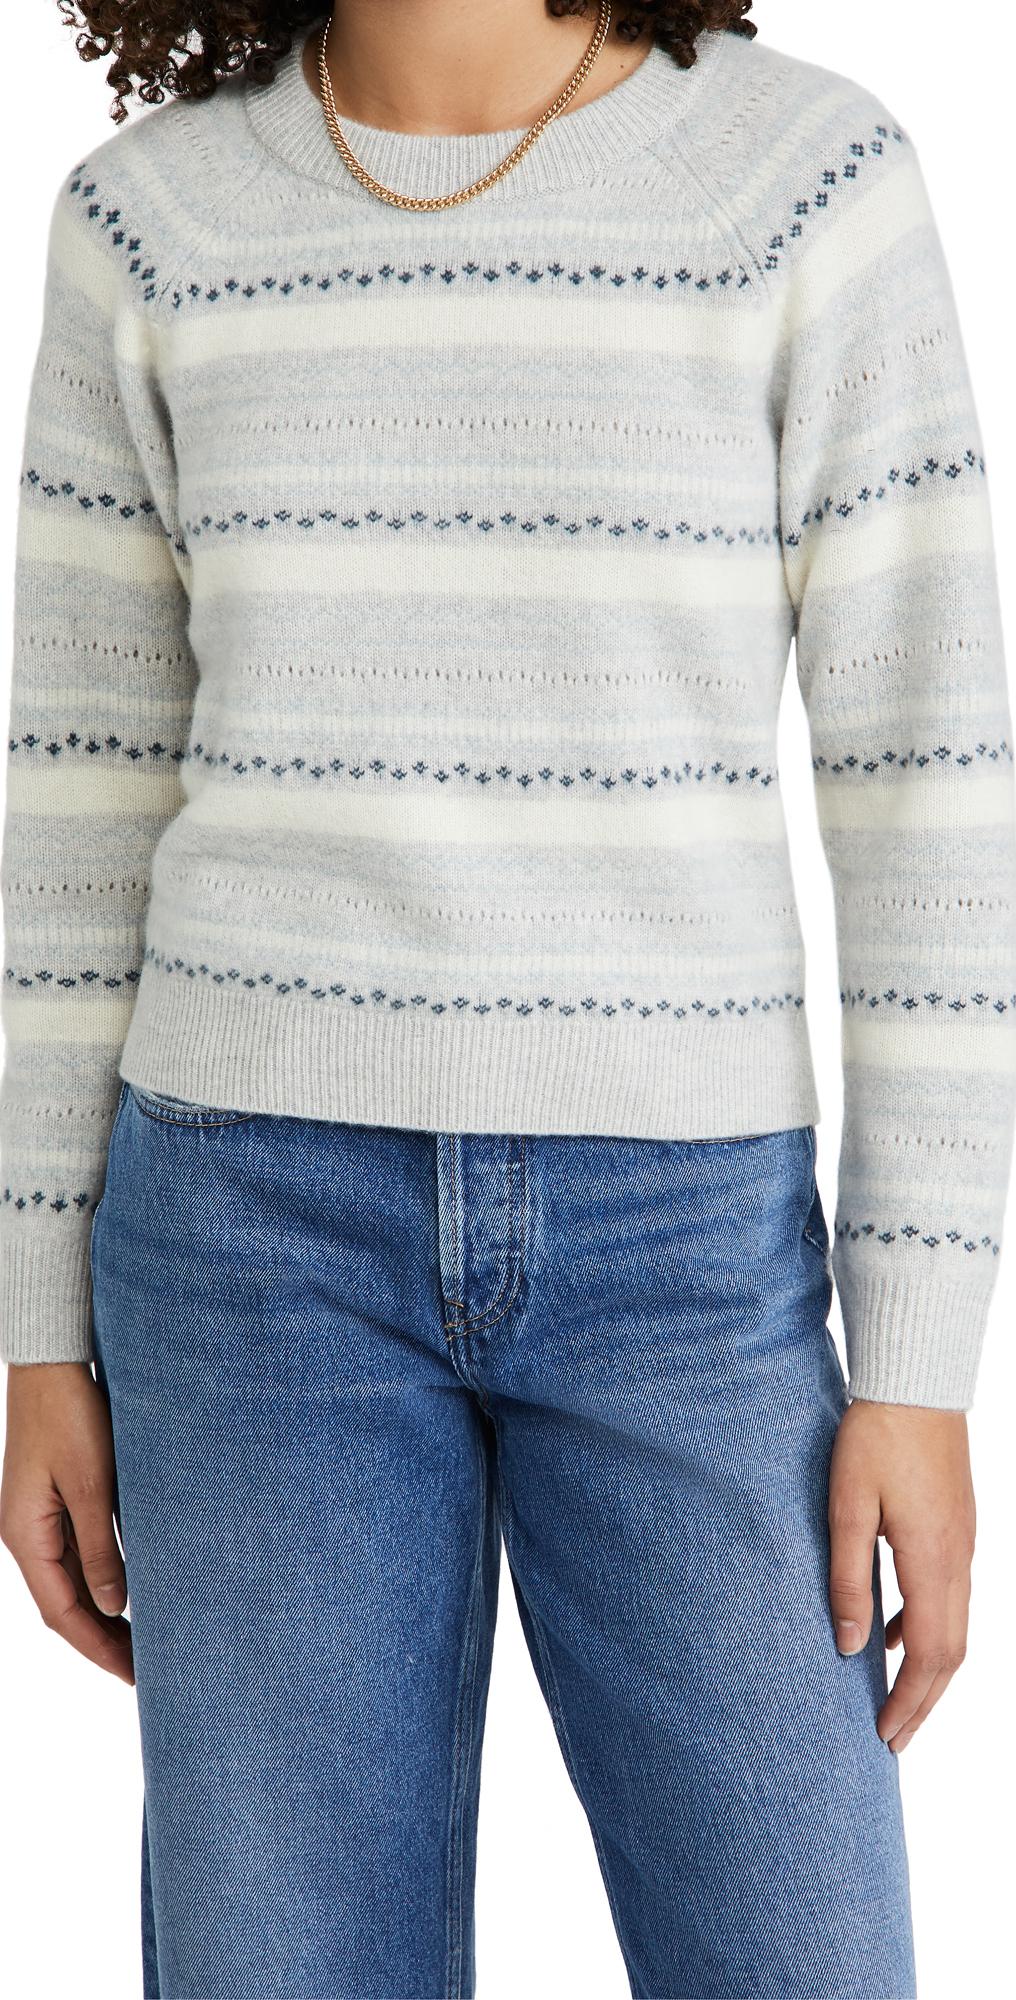 Club Monaco Boiled Cashmere Fair Isle Sweater